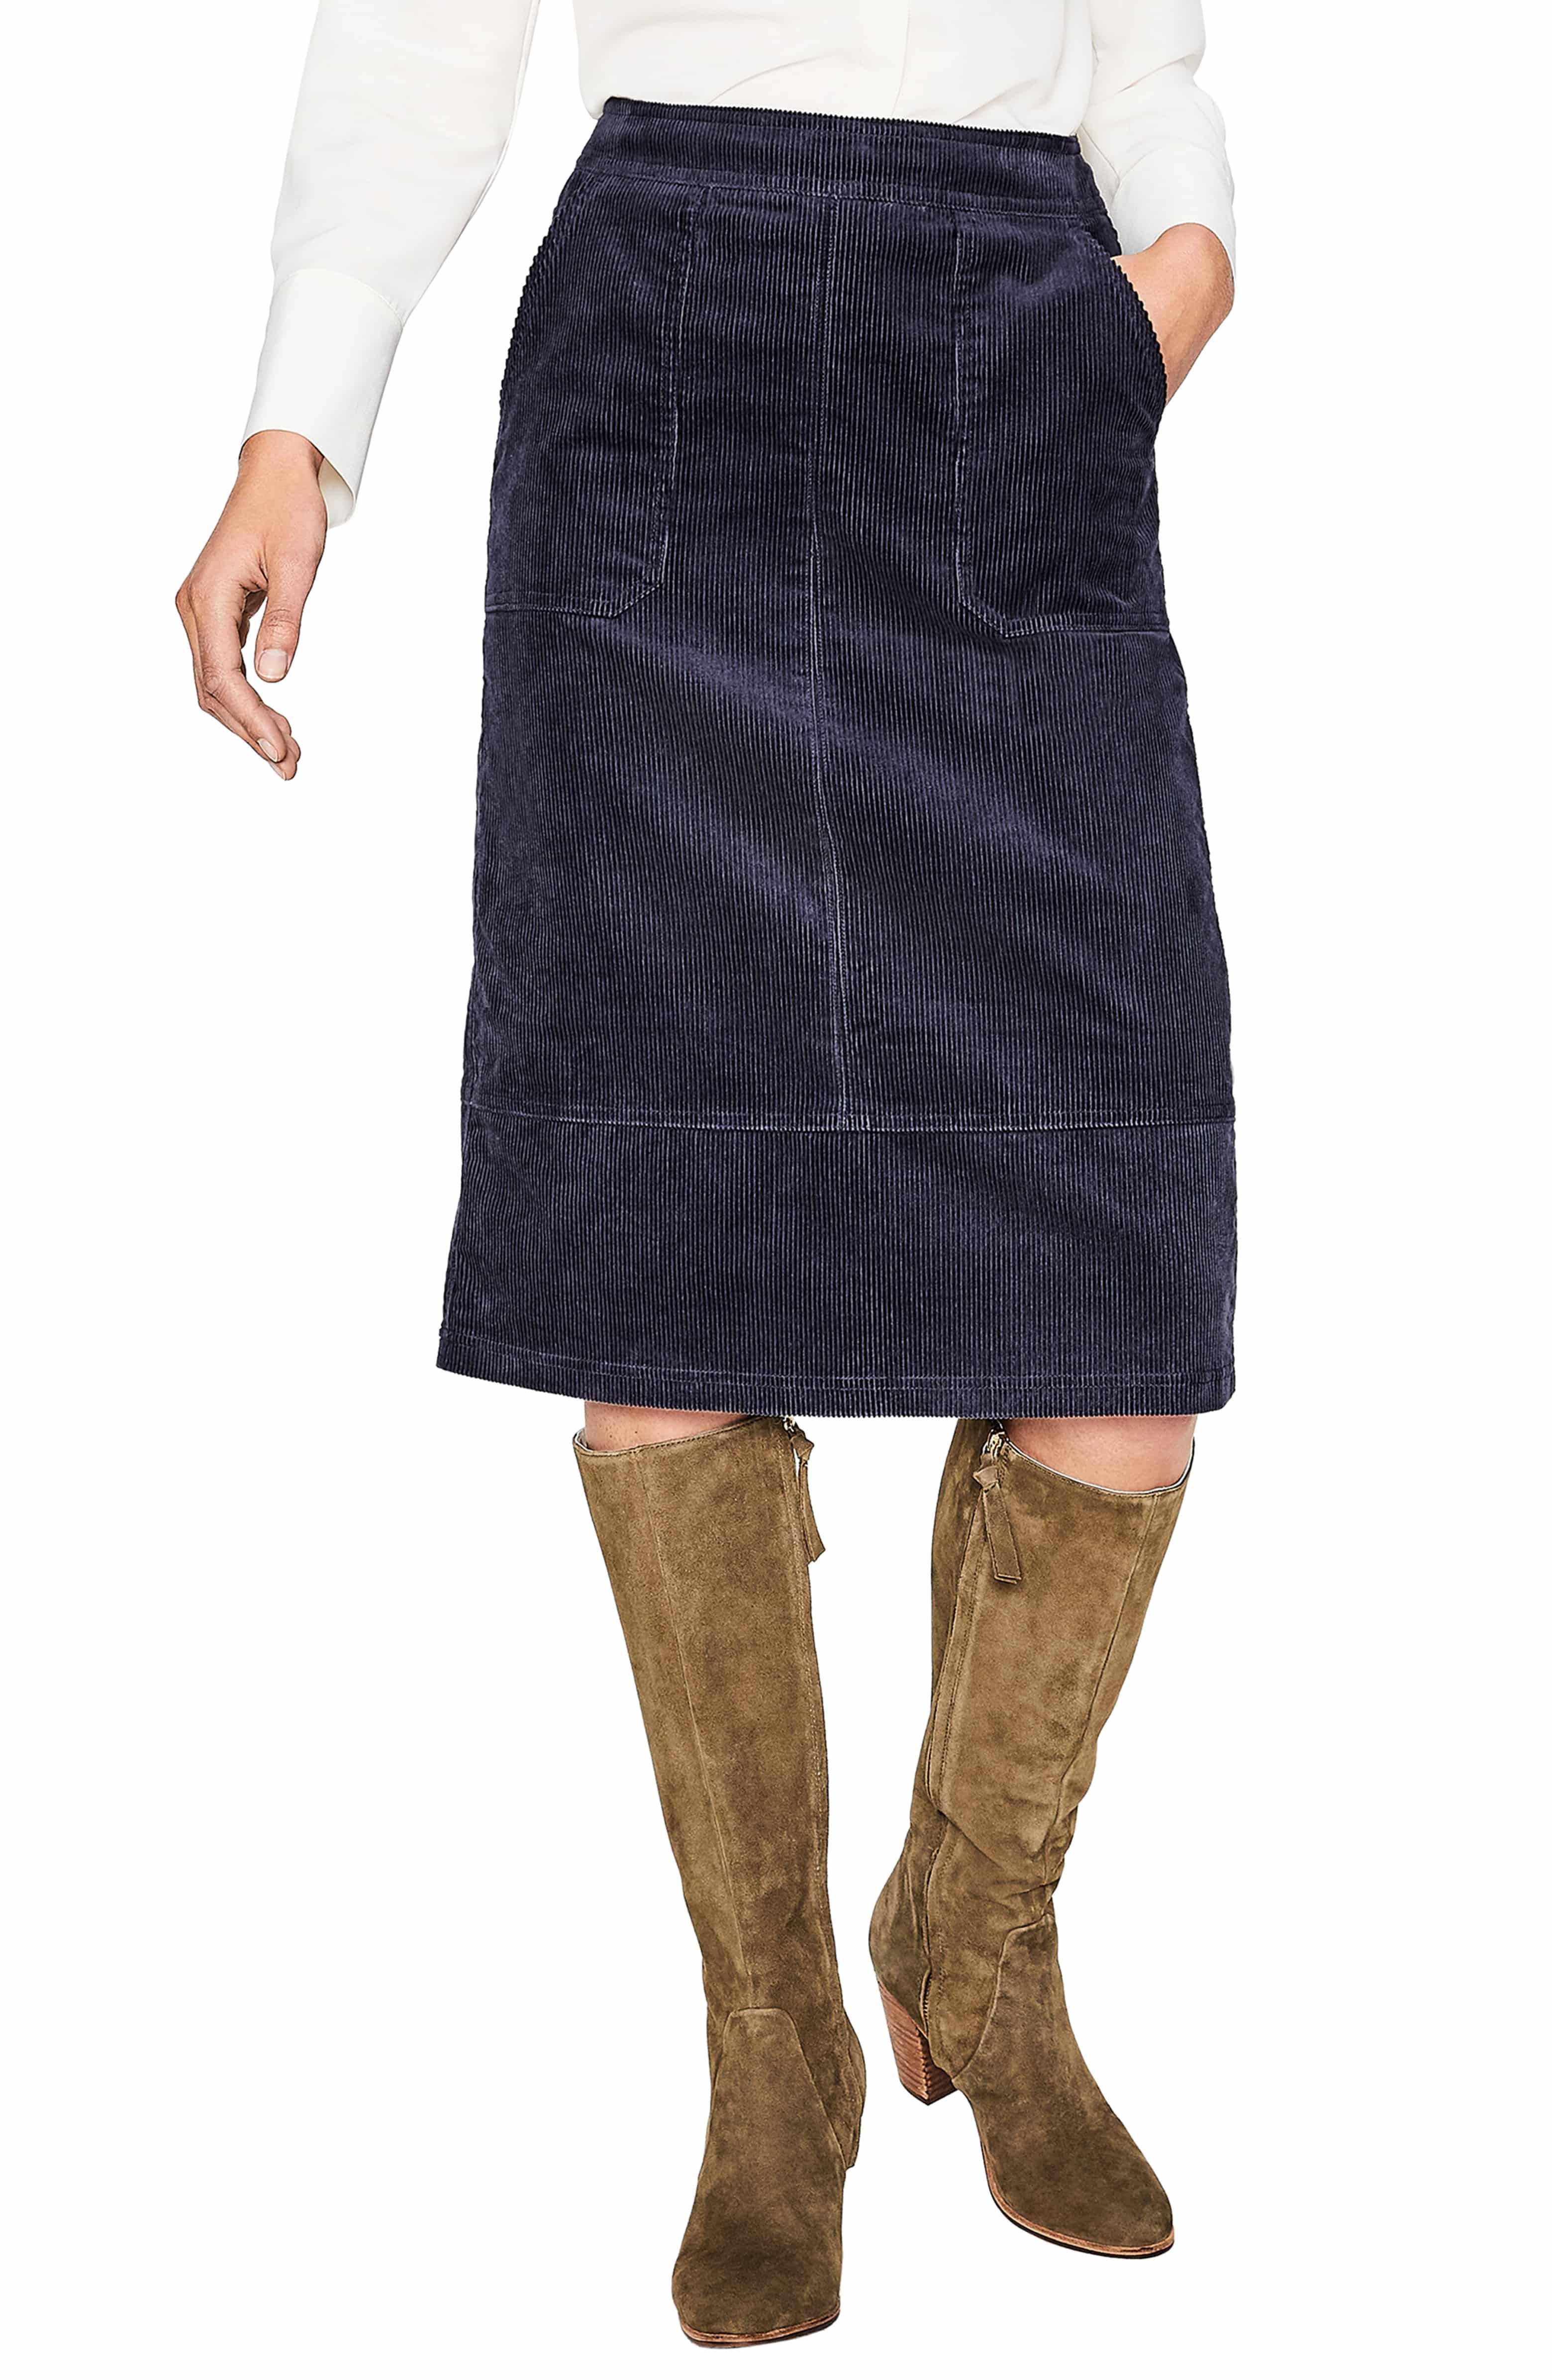 4692f0dae964 Patch Pocket Corduroy Midi Skirt Main color. #midiskirt #miniskirts #skirts  #skirtsuit